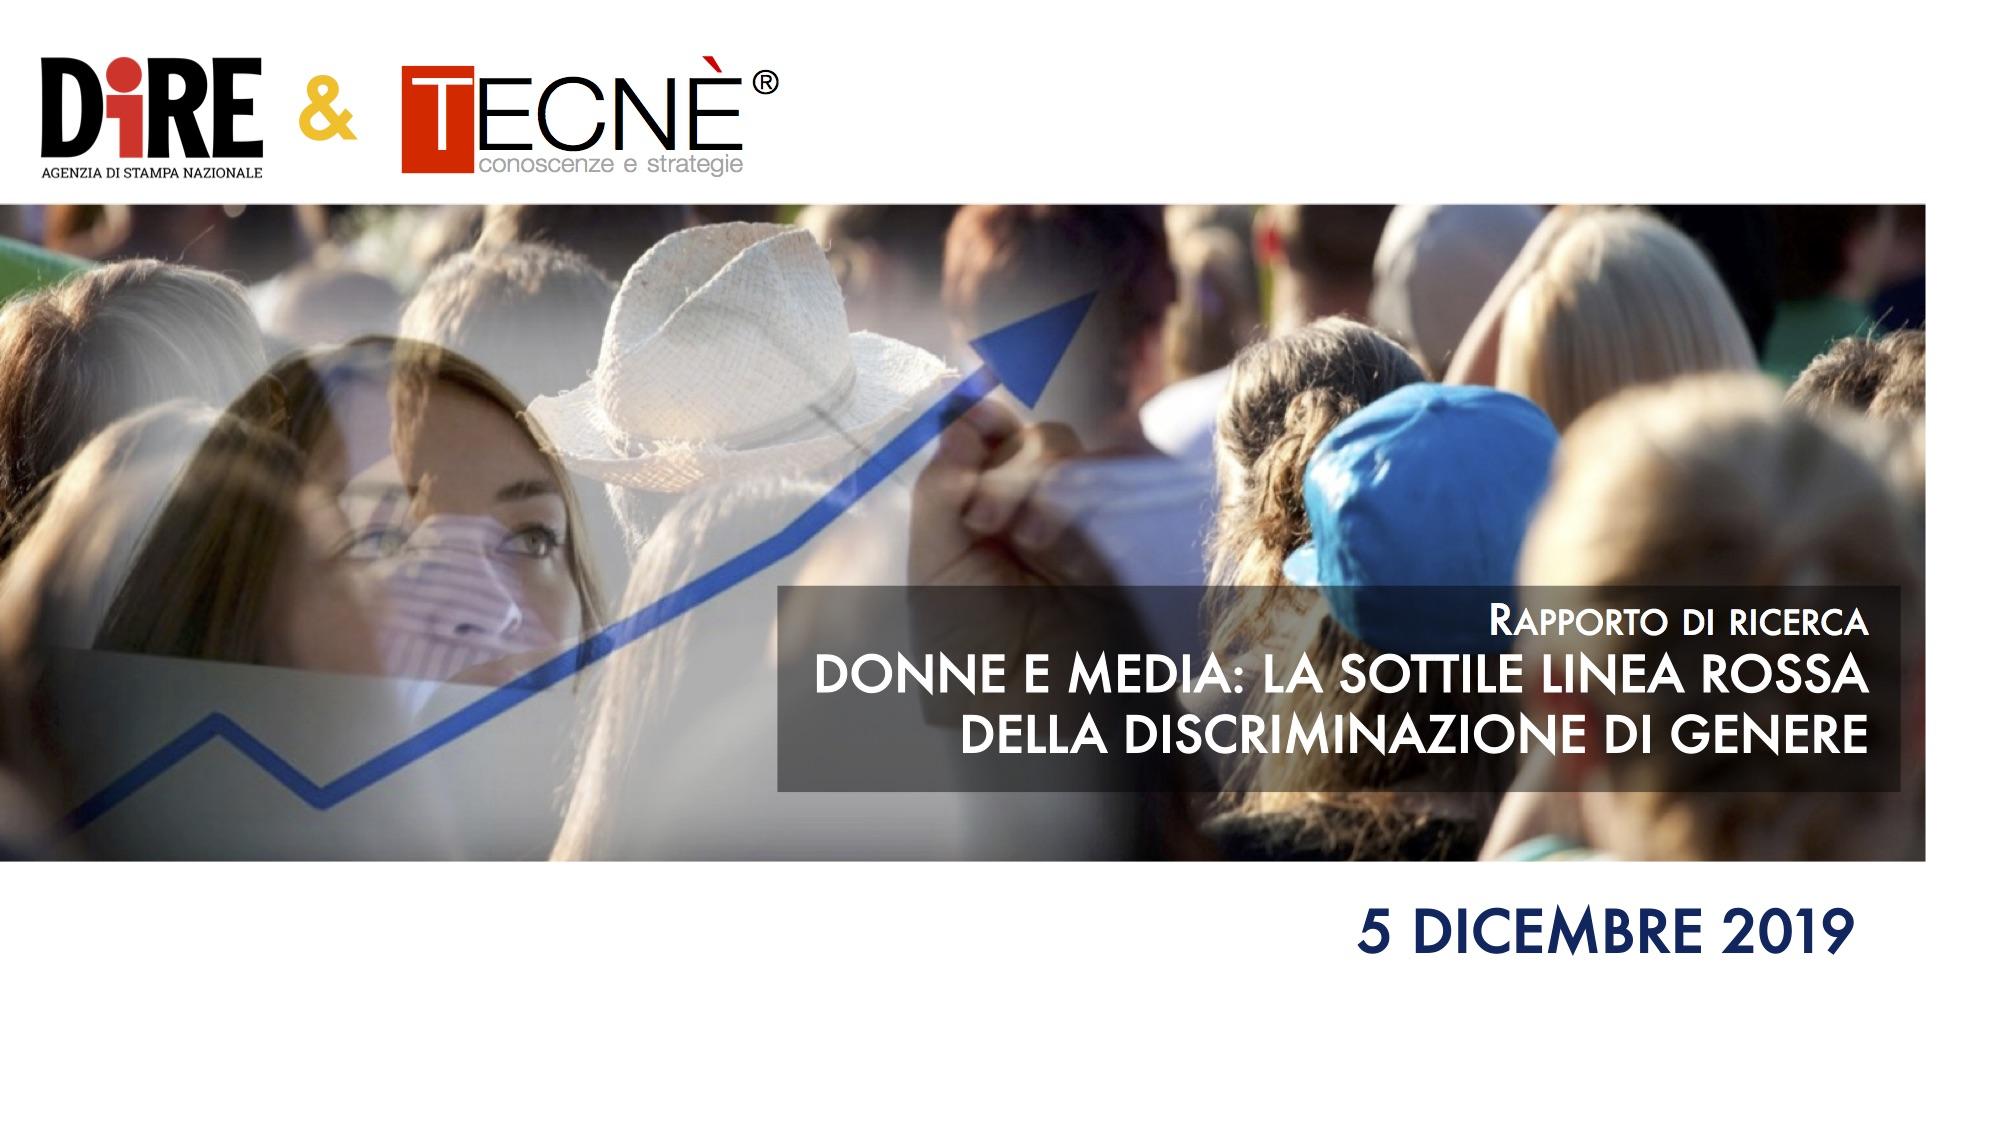 DONNE E MEDIA - 1